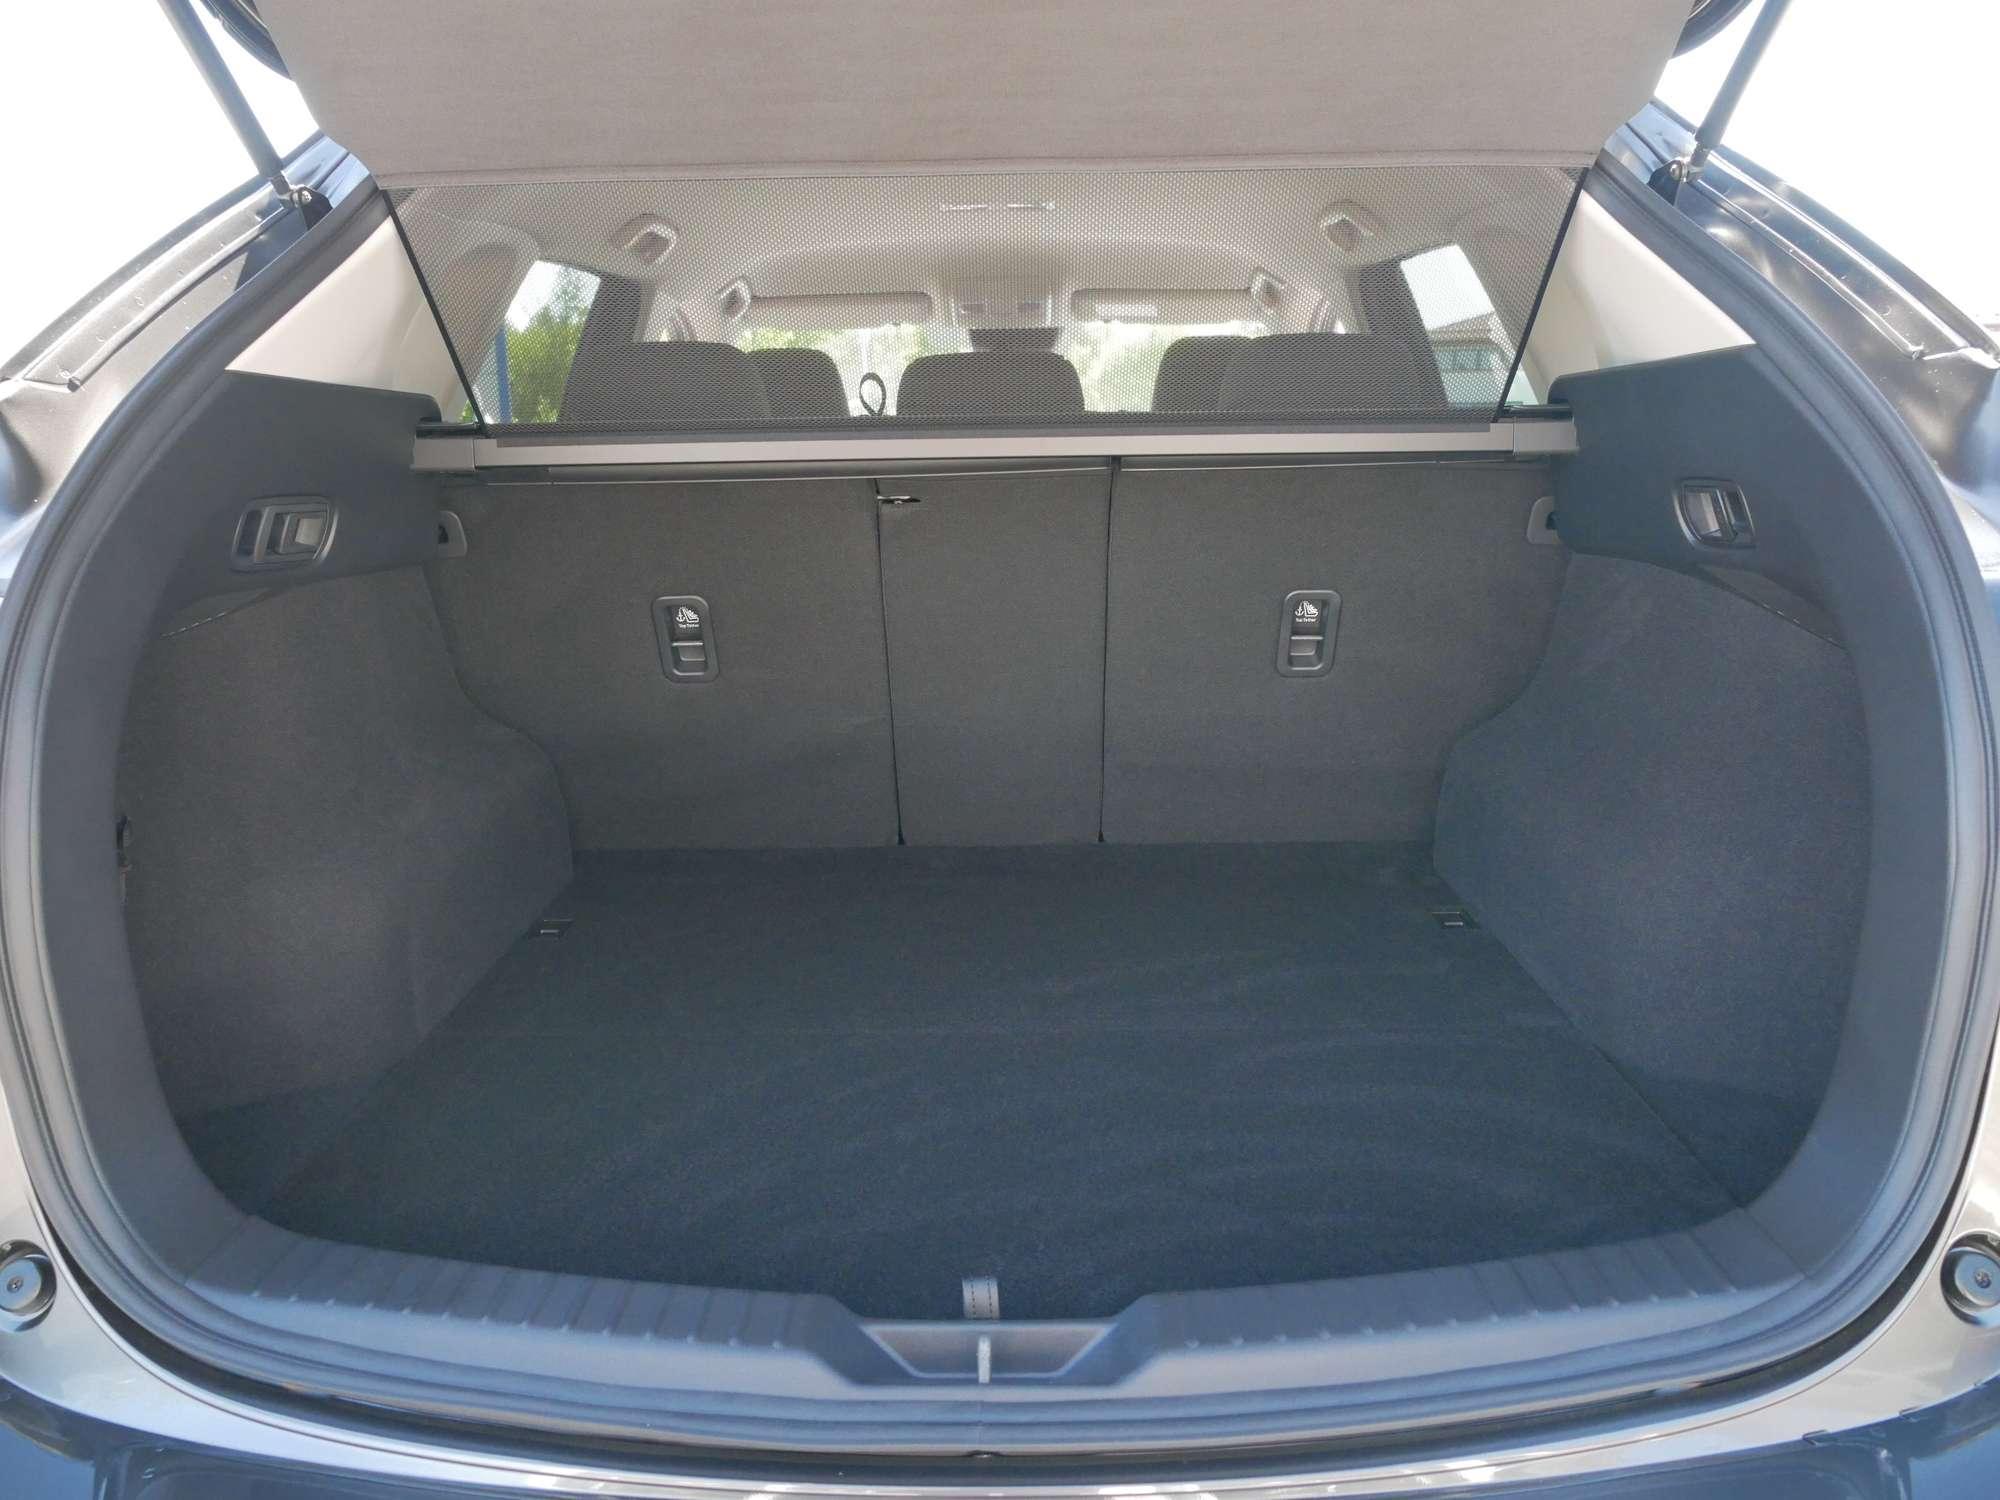 mazda cx 5 2019 kaufen m nchen auto till. Black Bedroom Furniture Sets. Home Design Ideas